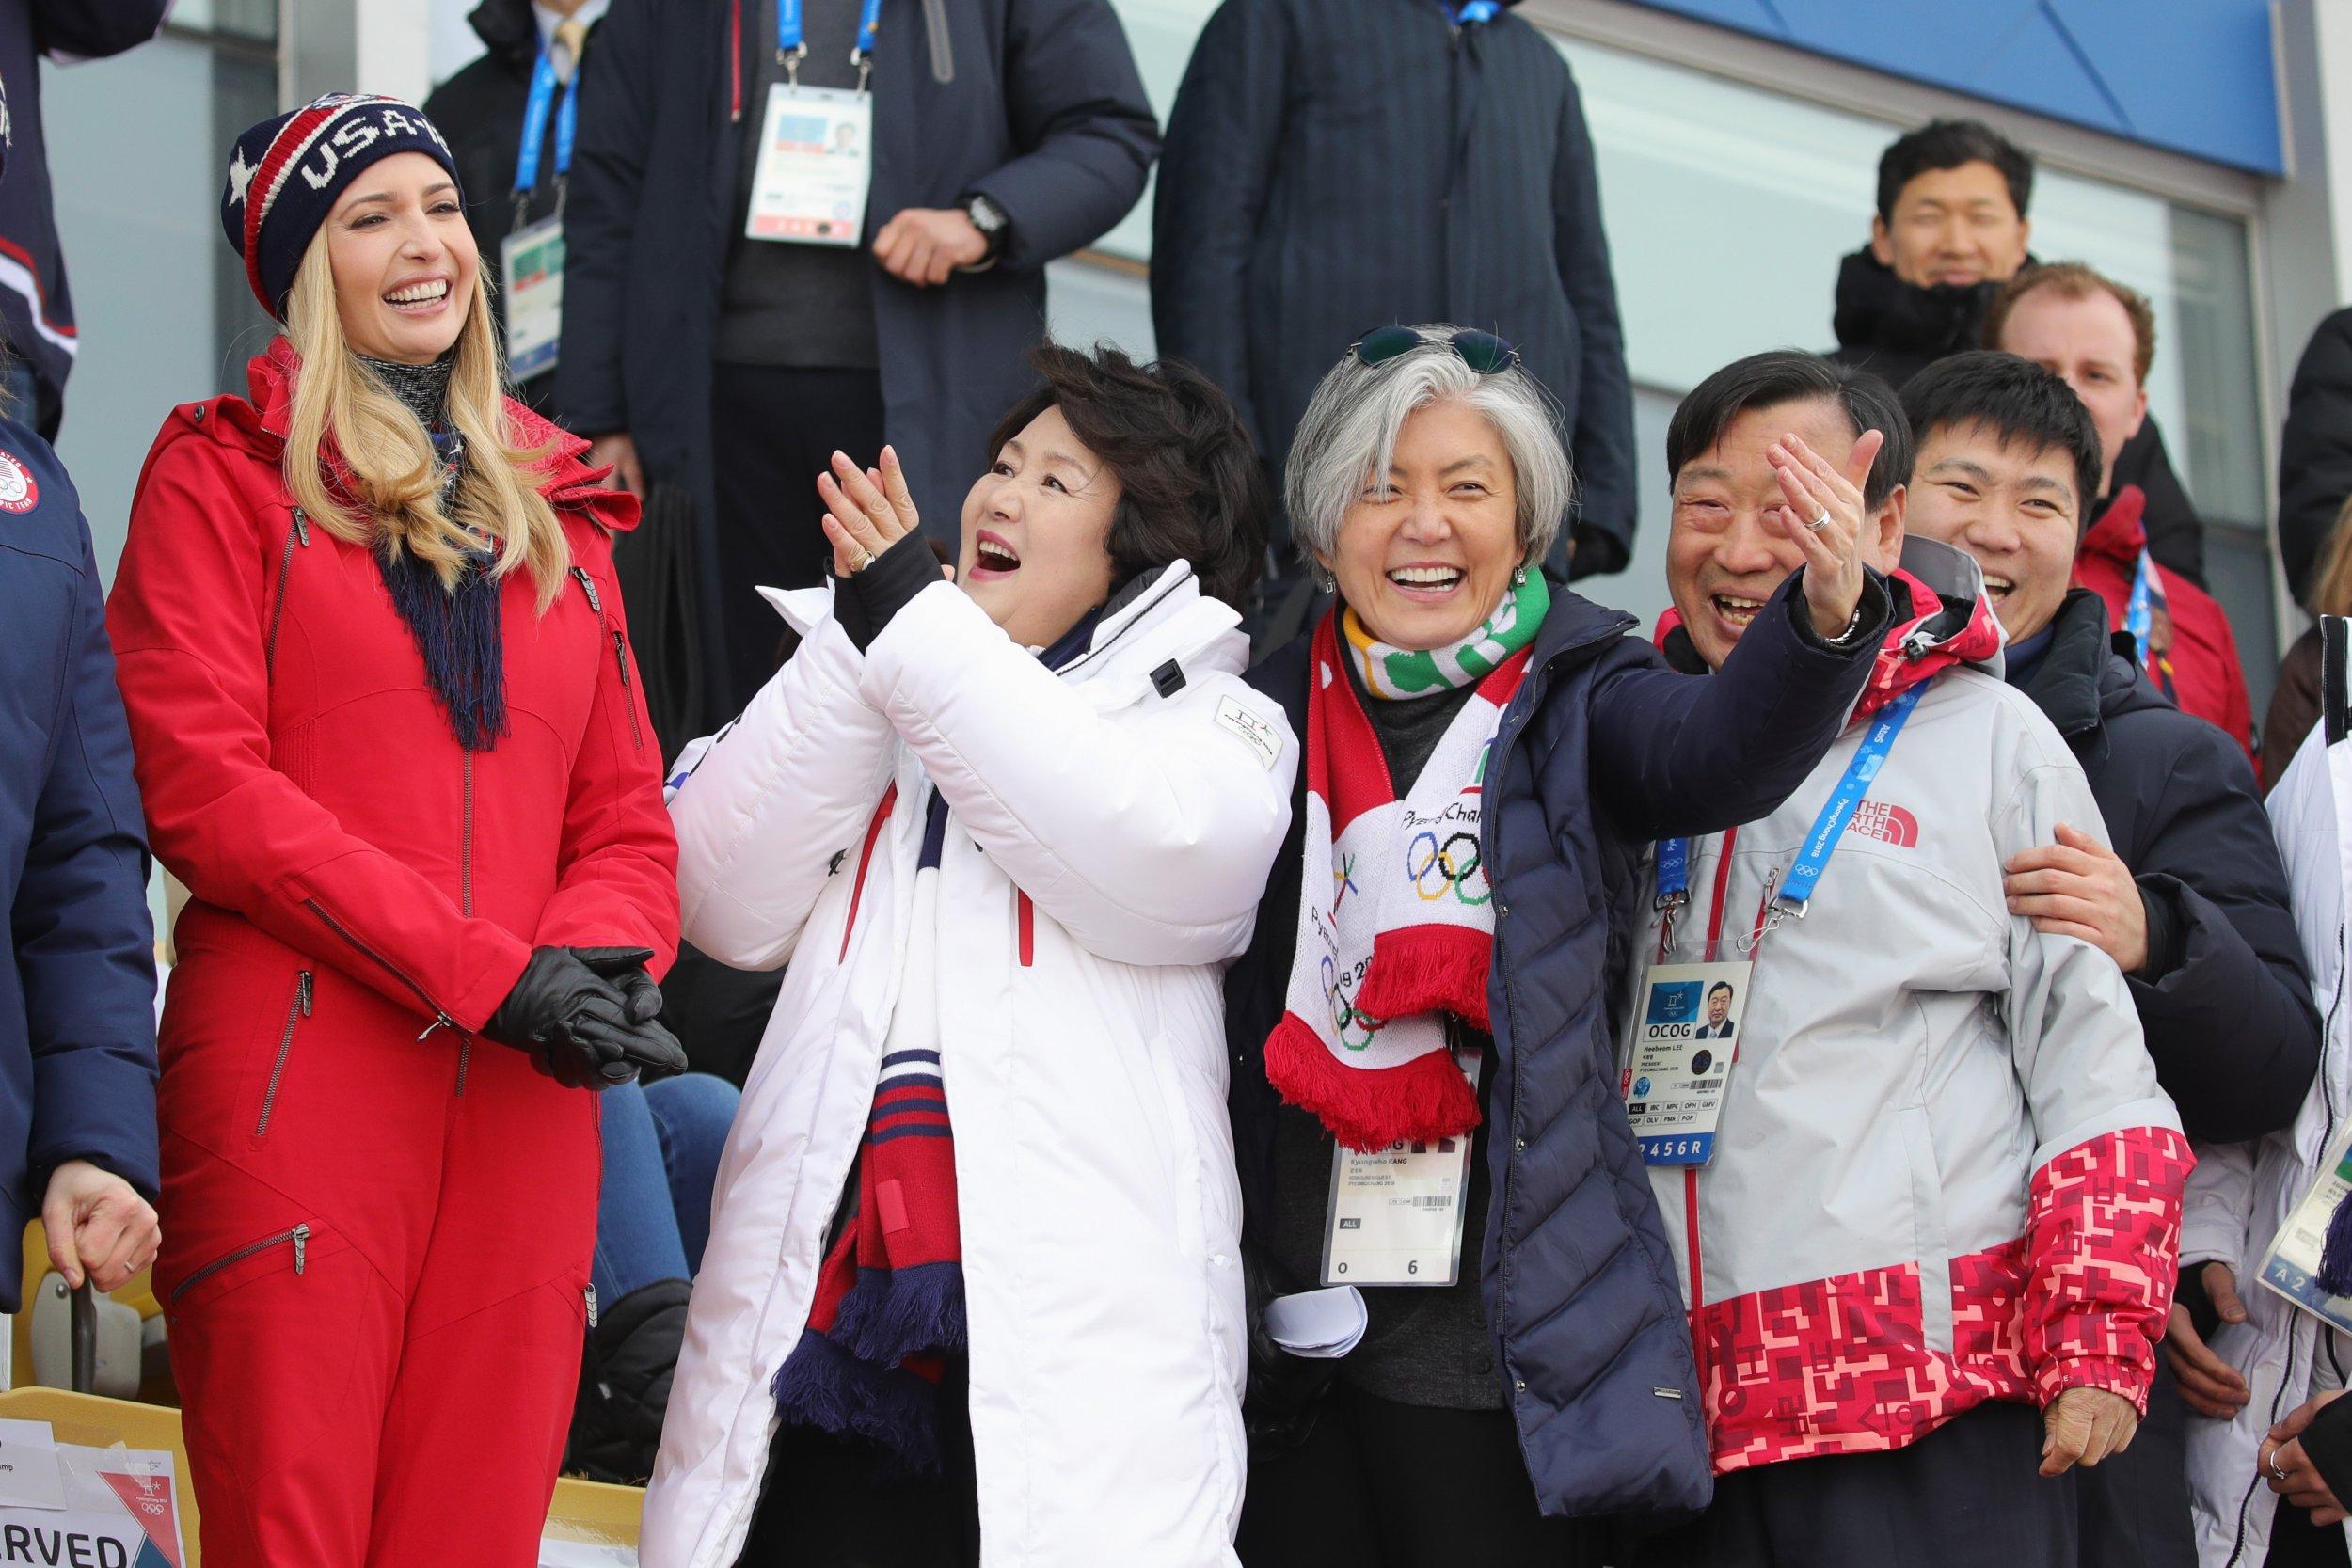 Ivanka Trump, not Rex Tillerson, will meet South Korea's foreign minister amid North Korea negotiations